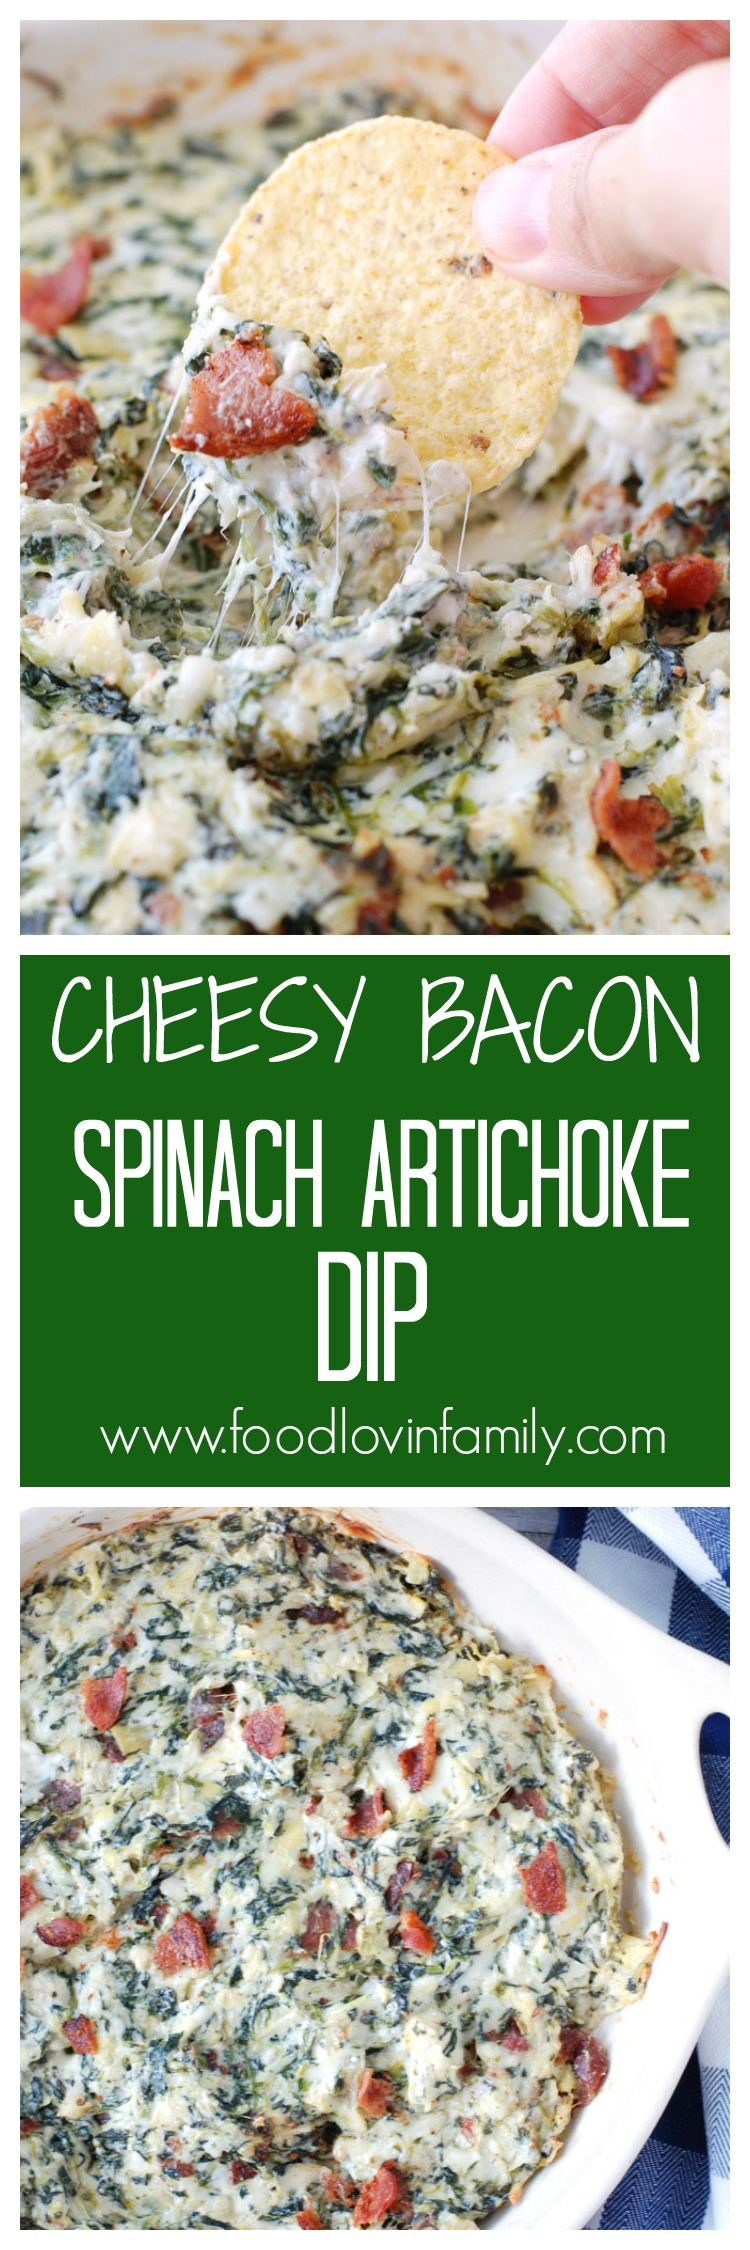 Cheesy Bacon Spinach Artichoke Dip is cheesy, creamy and so delicious!